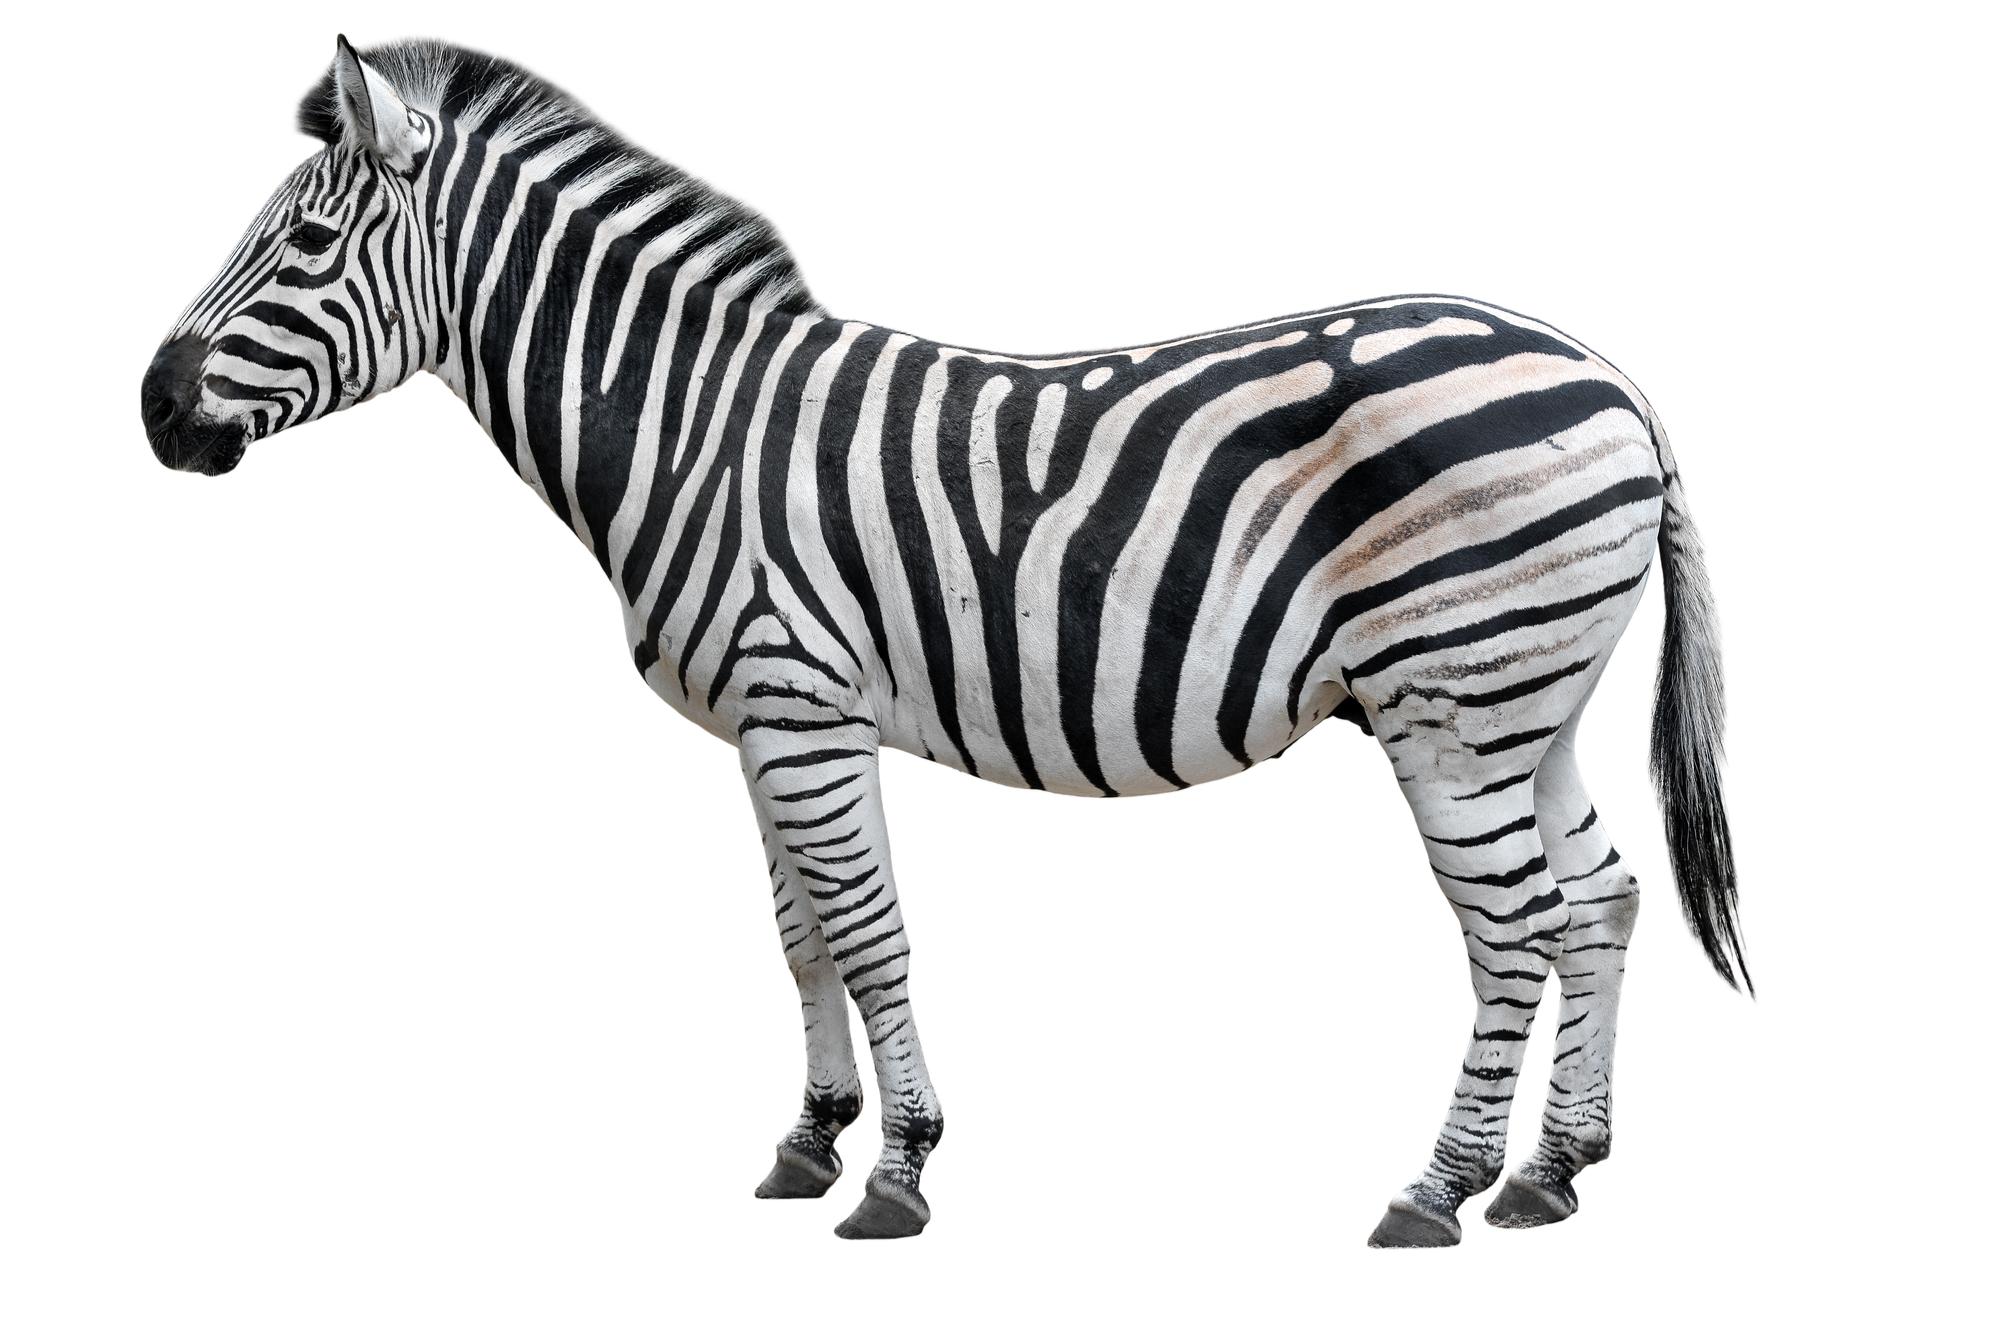 Zebra em fundo branco